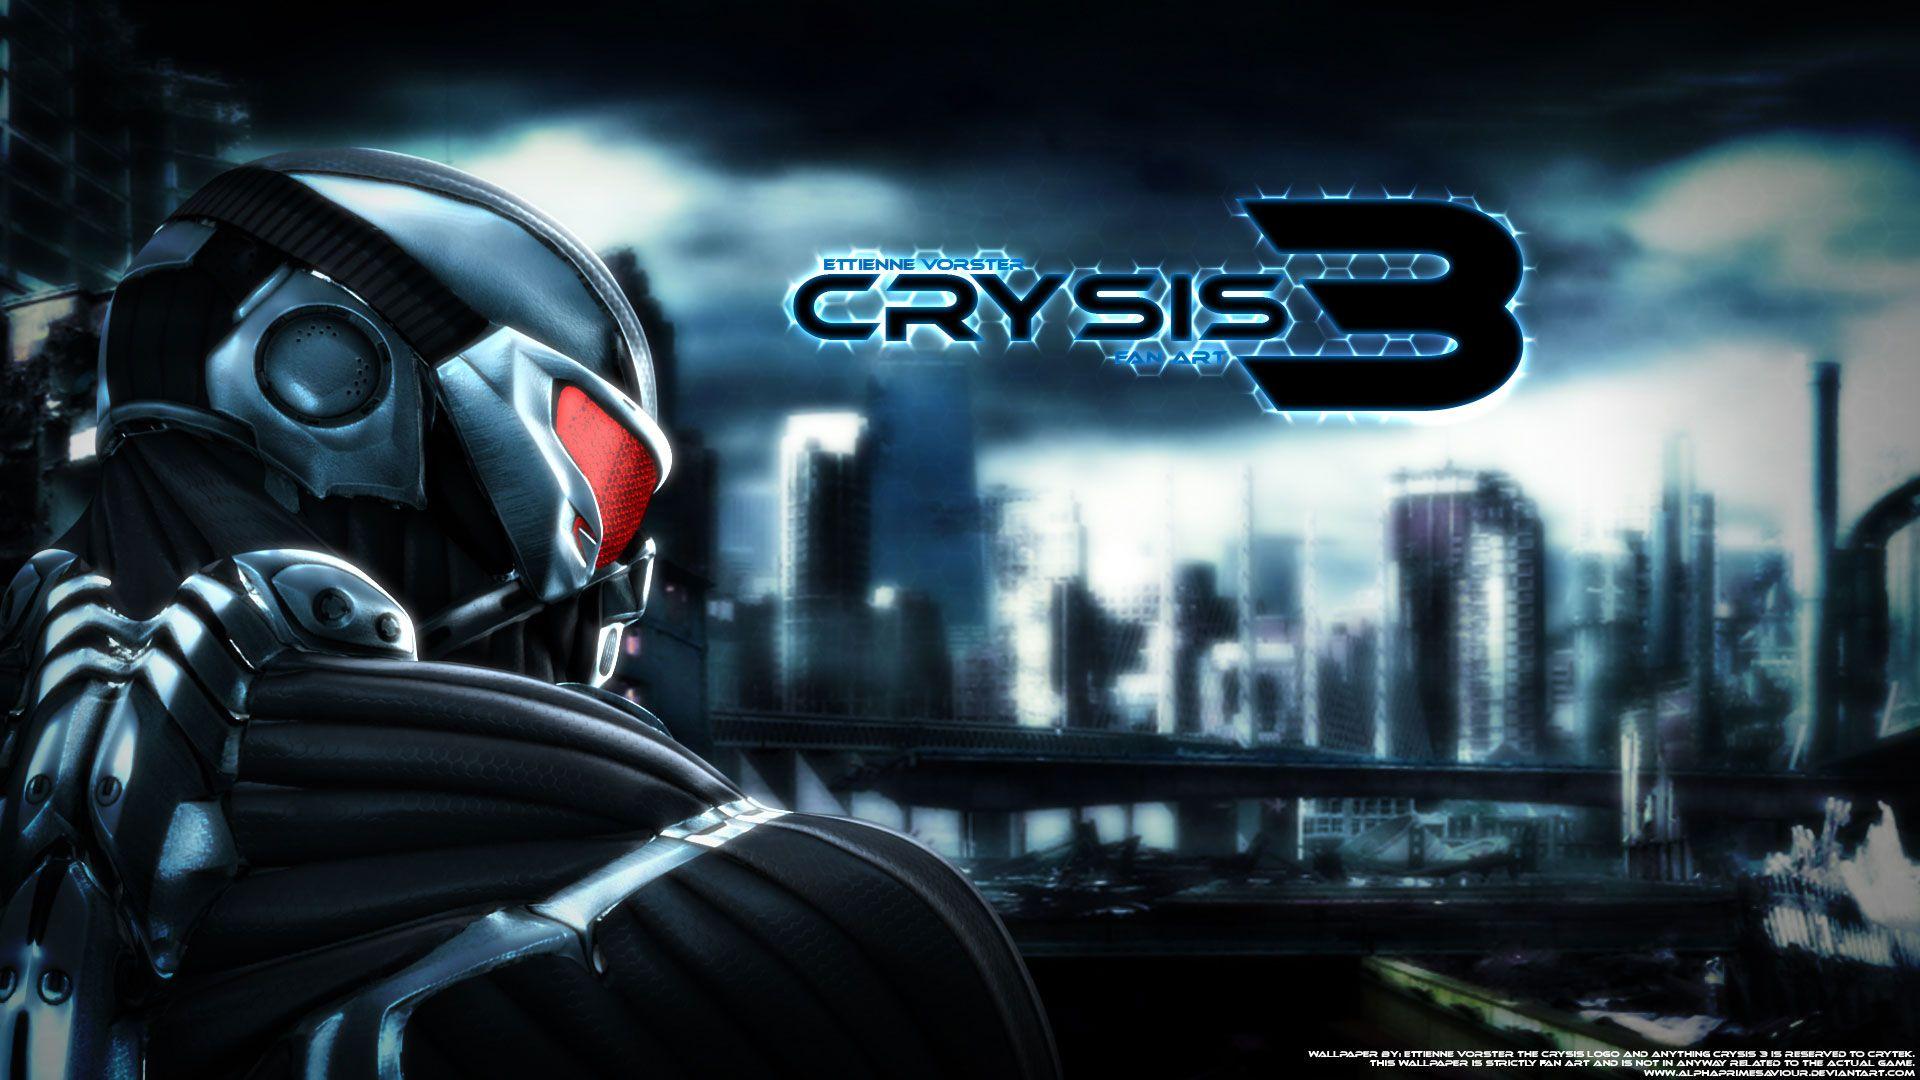 Crysis 3 Full HD Wallpaper Pack GAME RIPS Arena